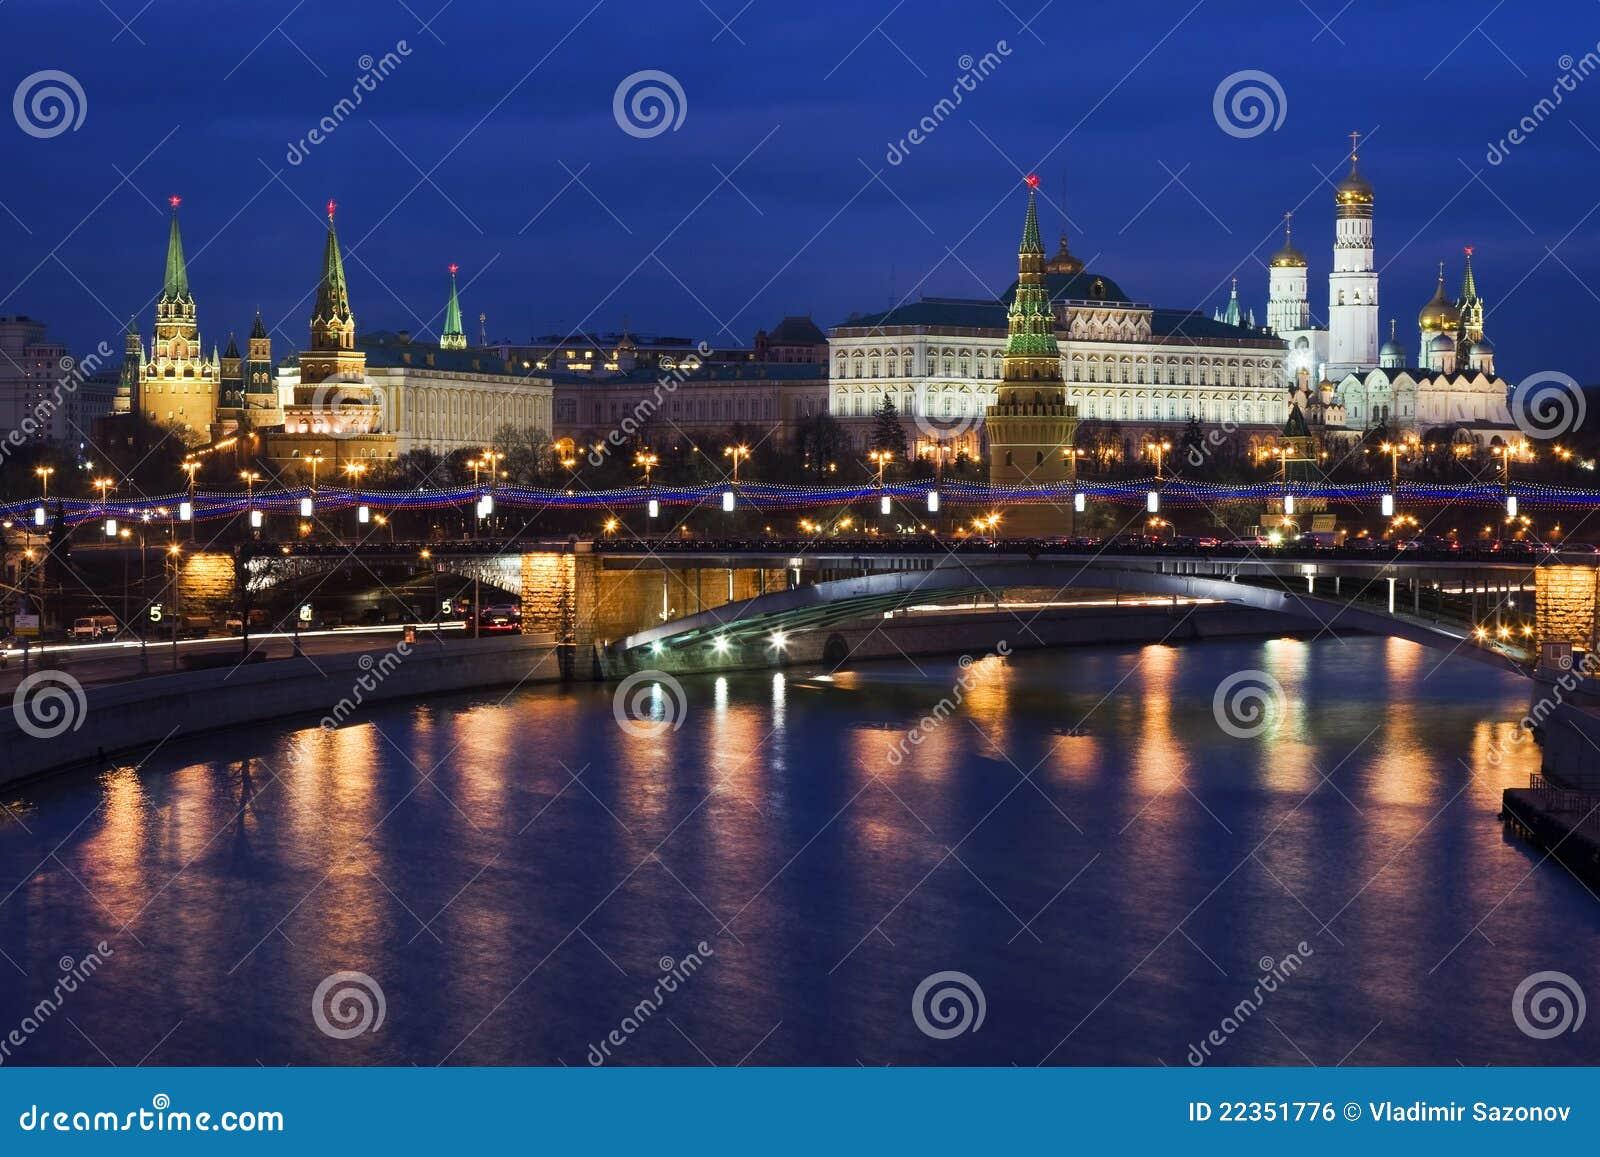 Nacht het Kremlin, Moskou, Rusland